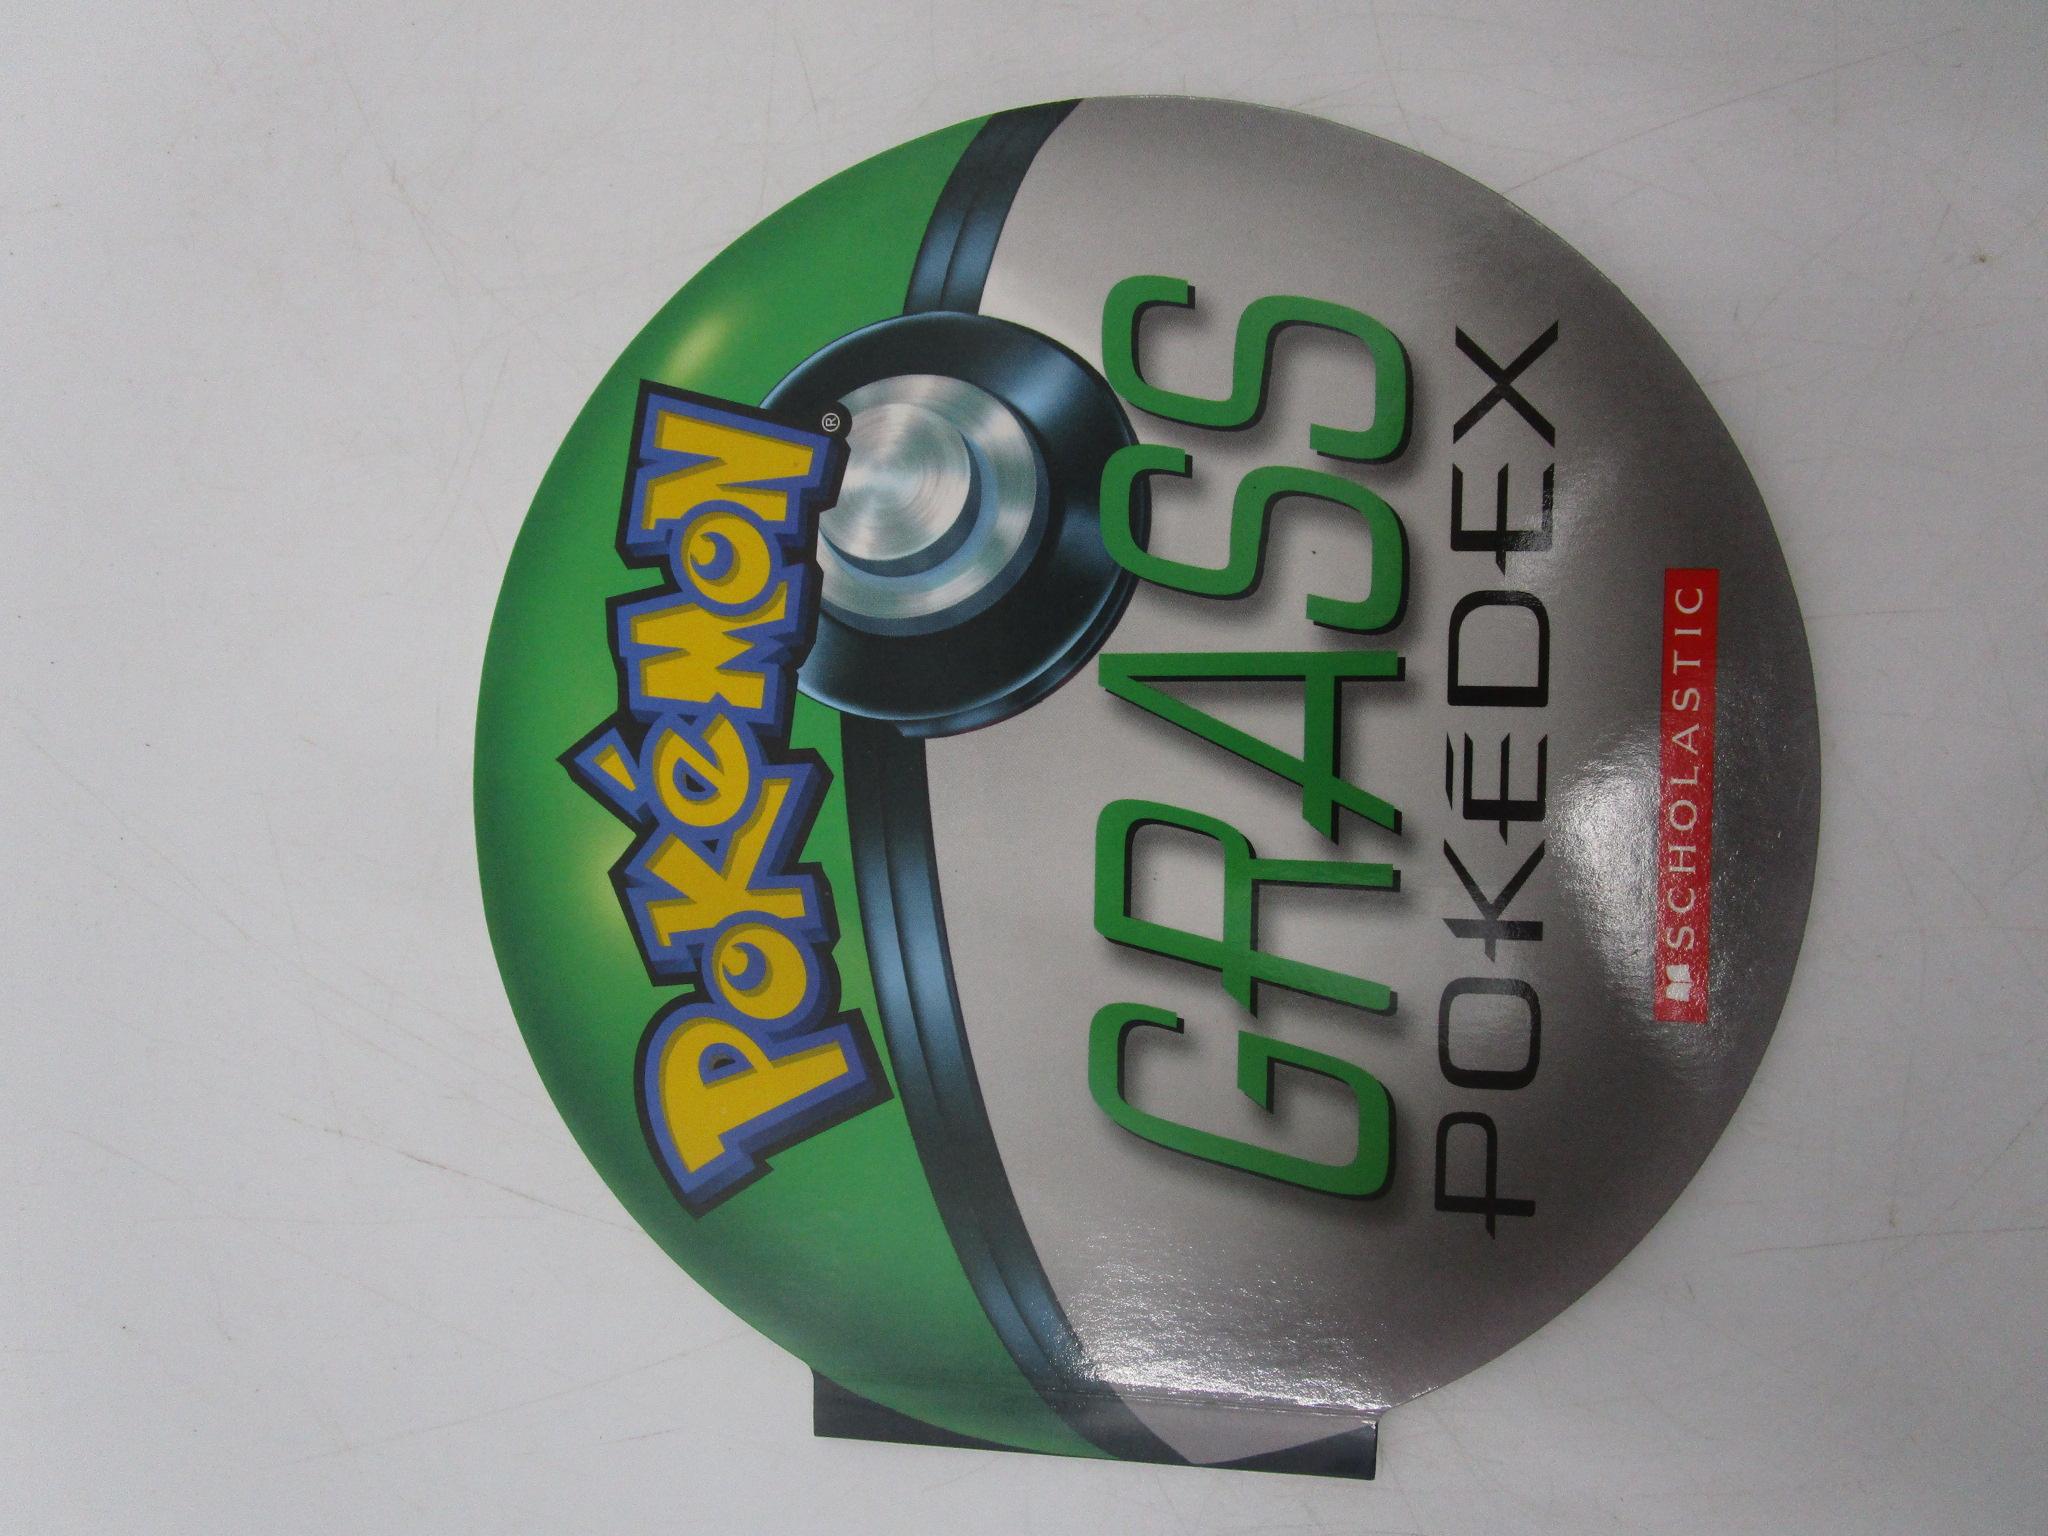 Image for Pokemon Grass Pokedex (Grass Pokedeck) First Edition